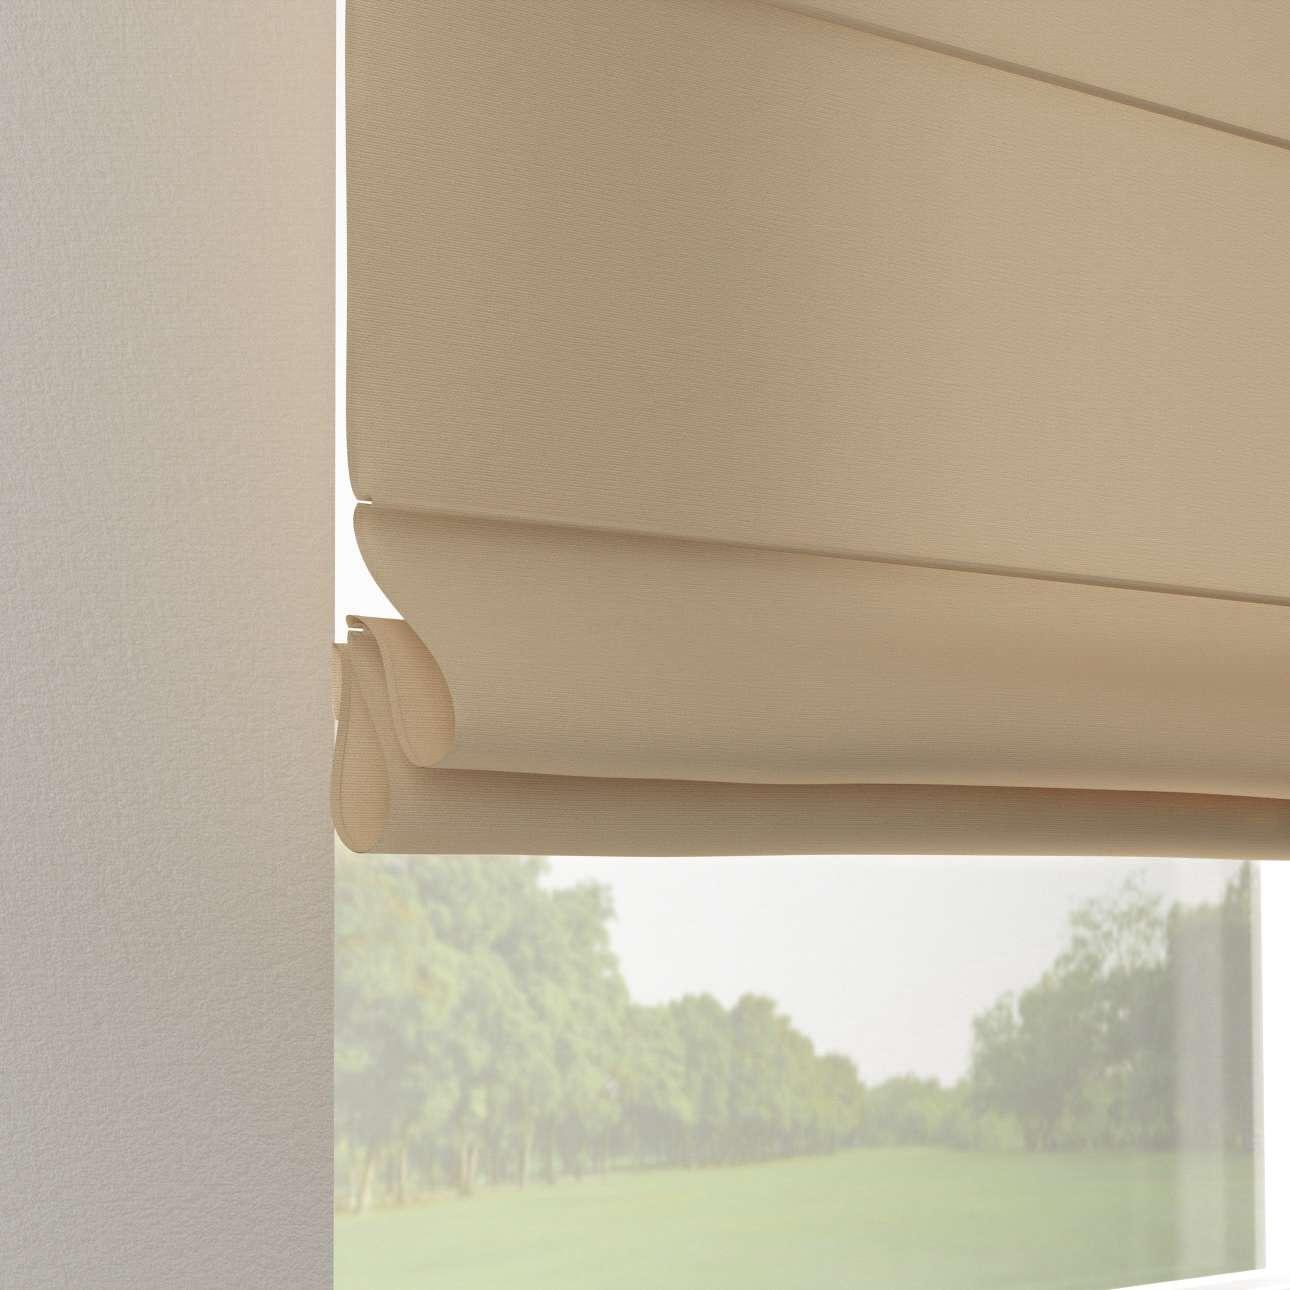 Verona raffrolók 80 x 170 cm a kollekcióból Bútorszövet Cotton Panama, Dekoranyag: 702-01